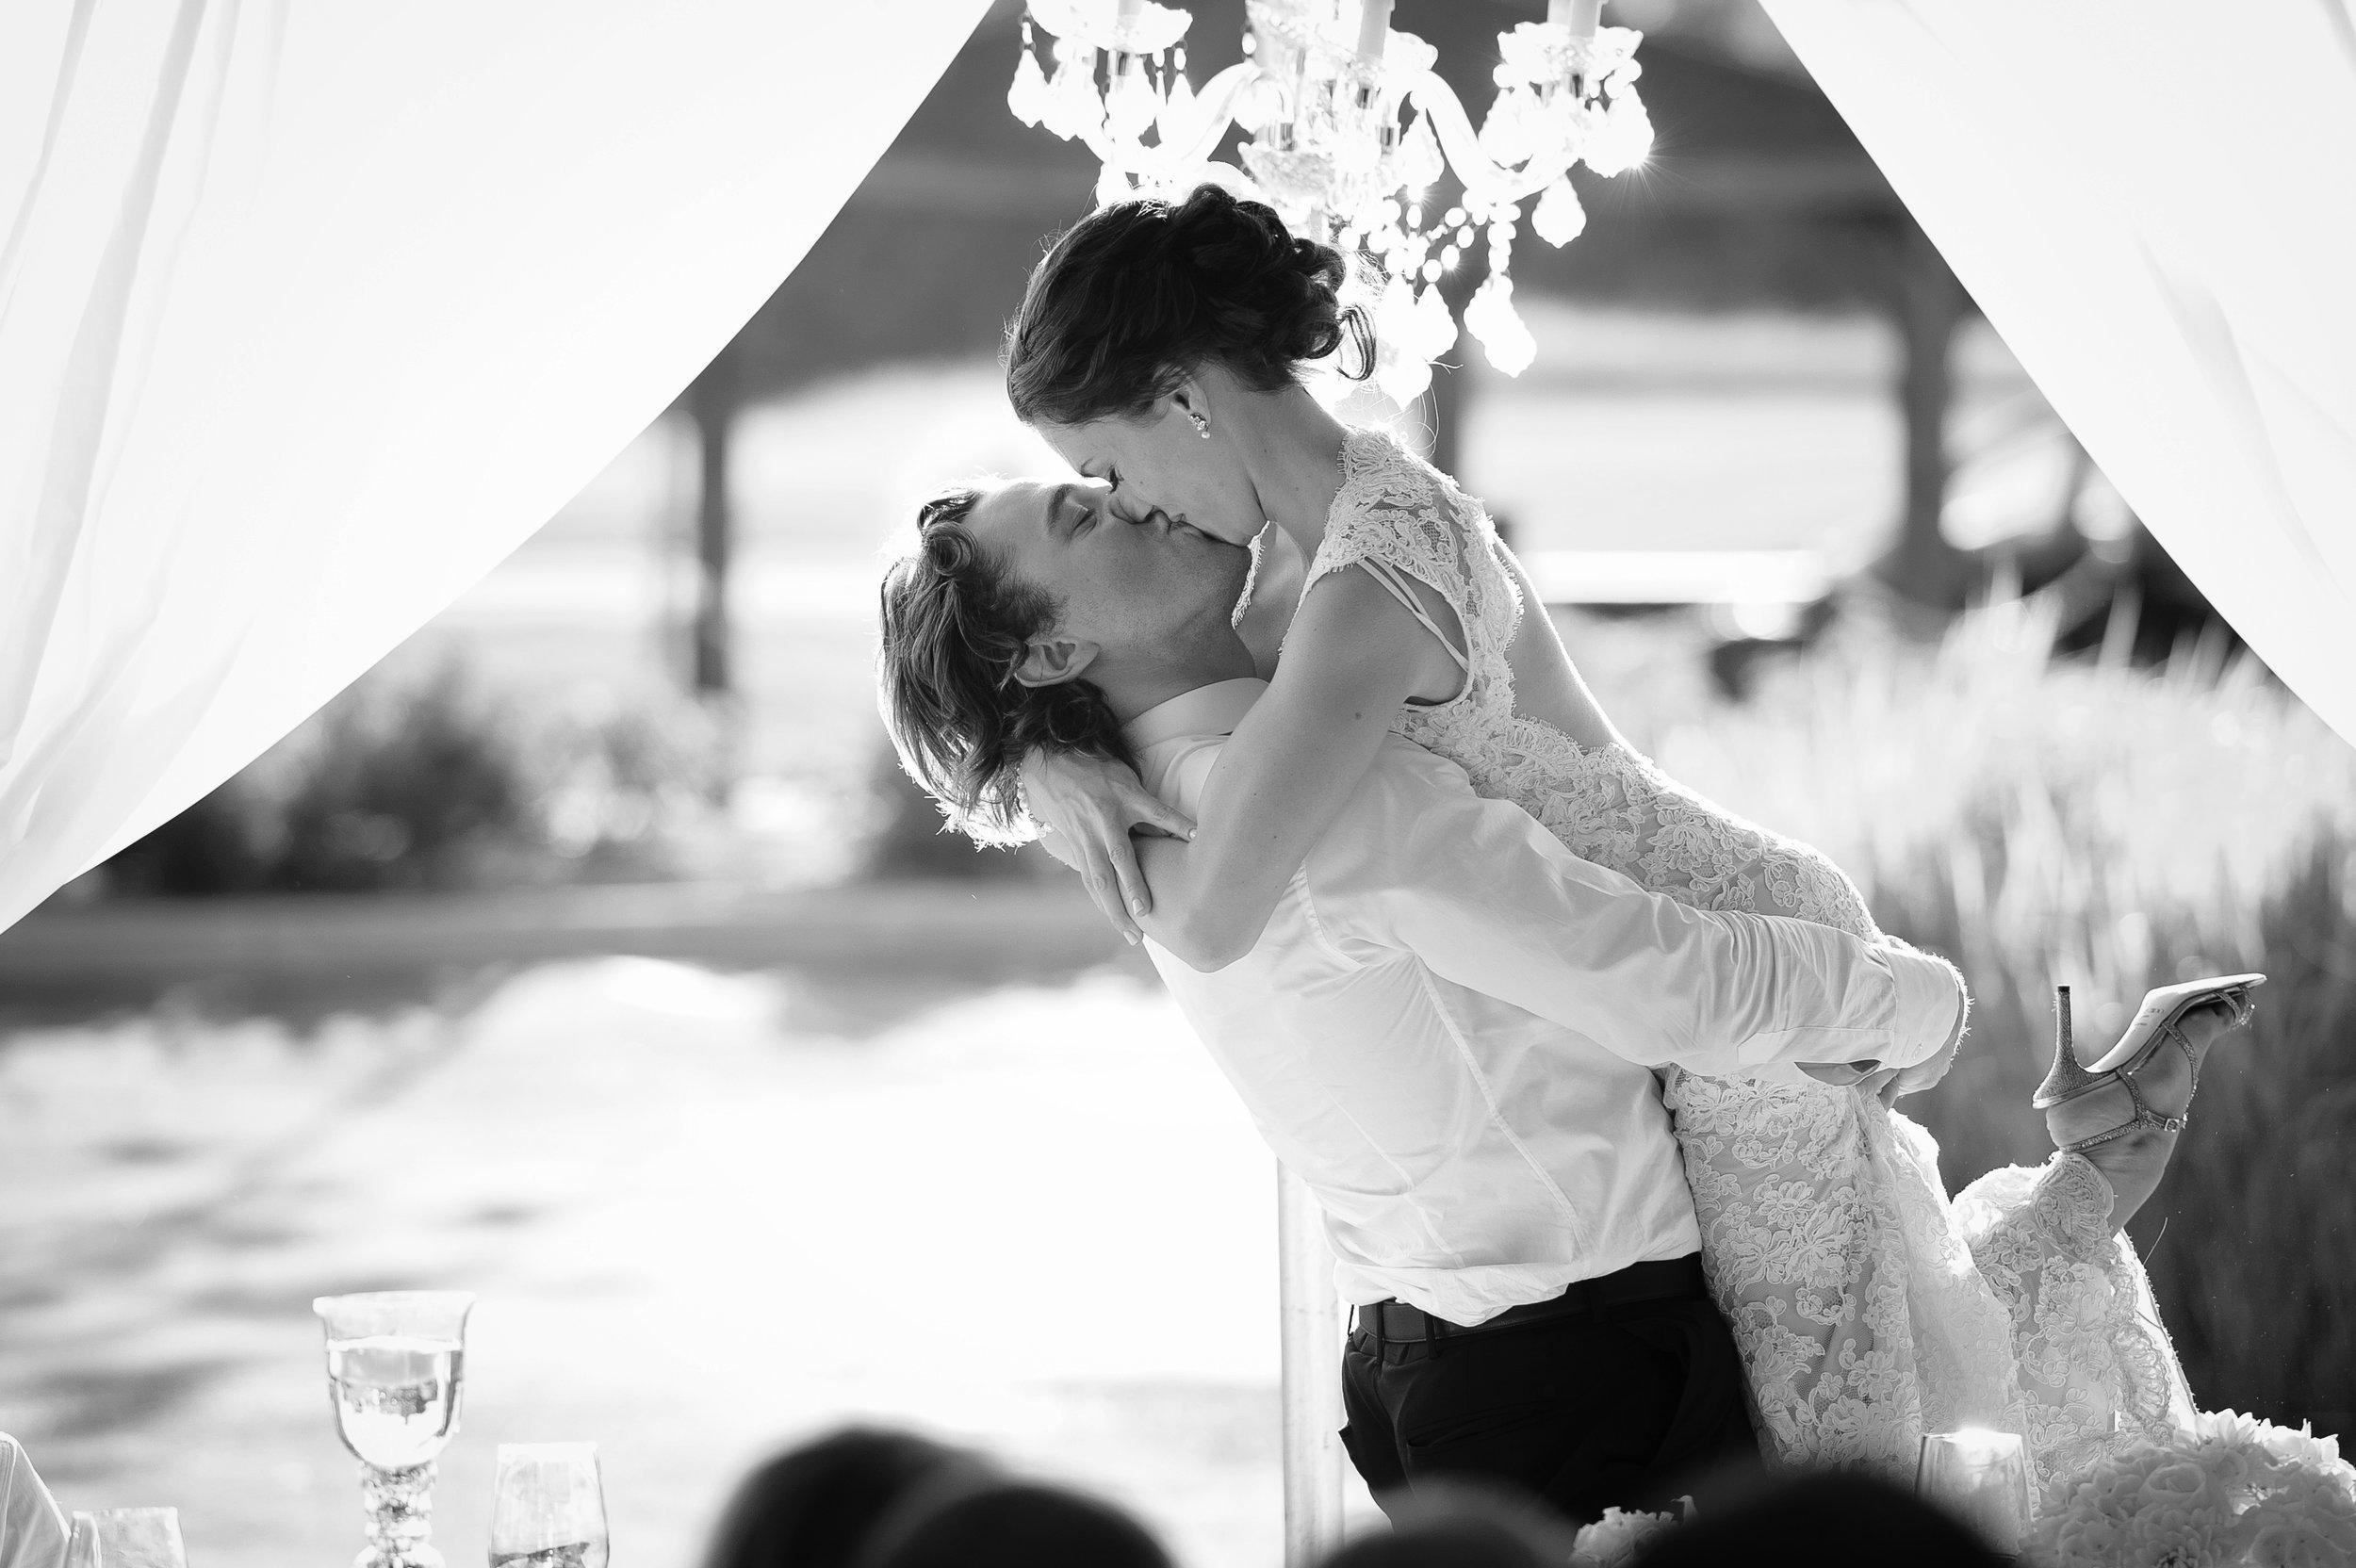 bride-groom-big-kiss-tent.JPG